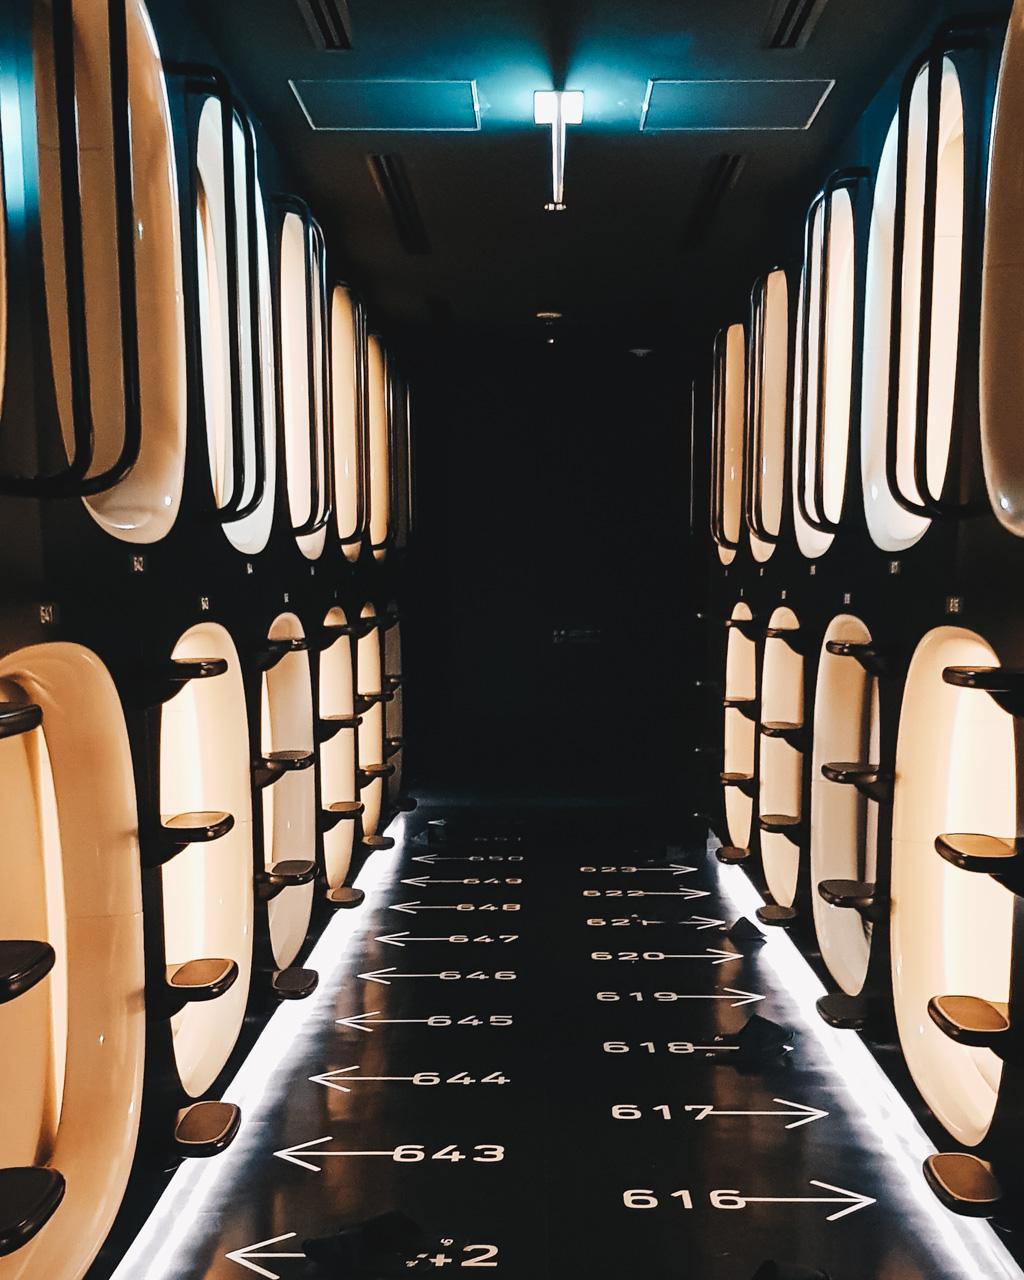 capsule hotel review